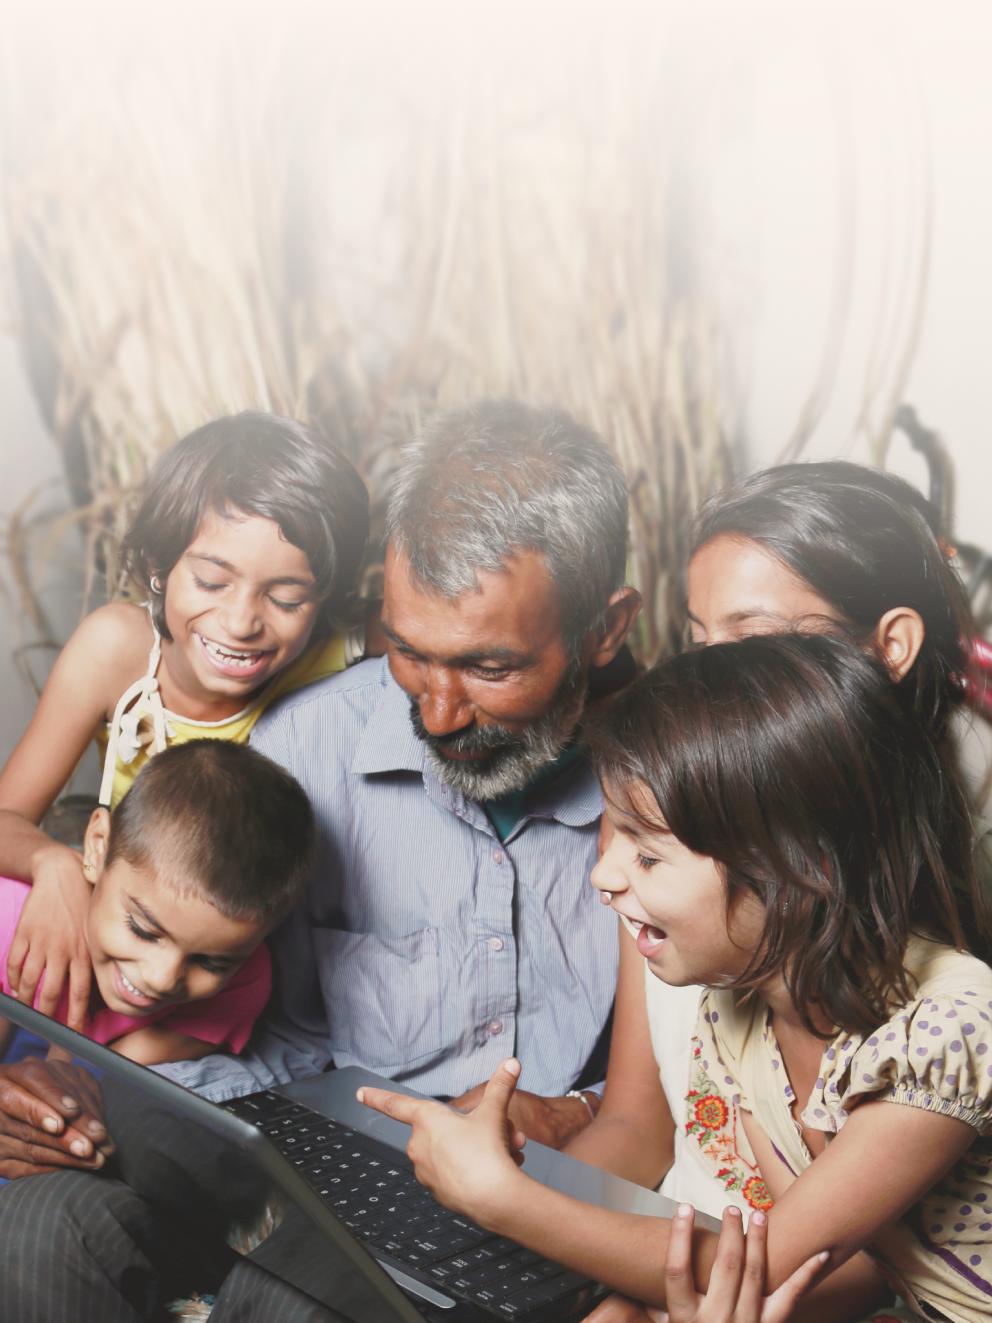 Shaping a digital future that belongs to everyone